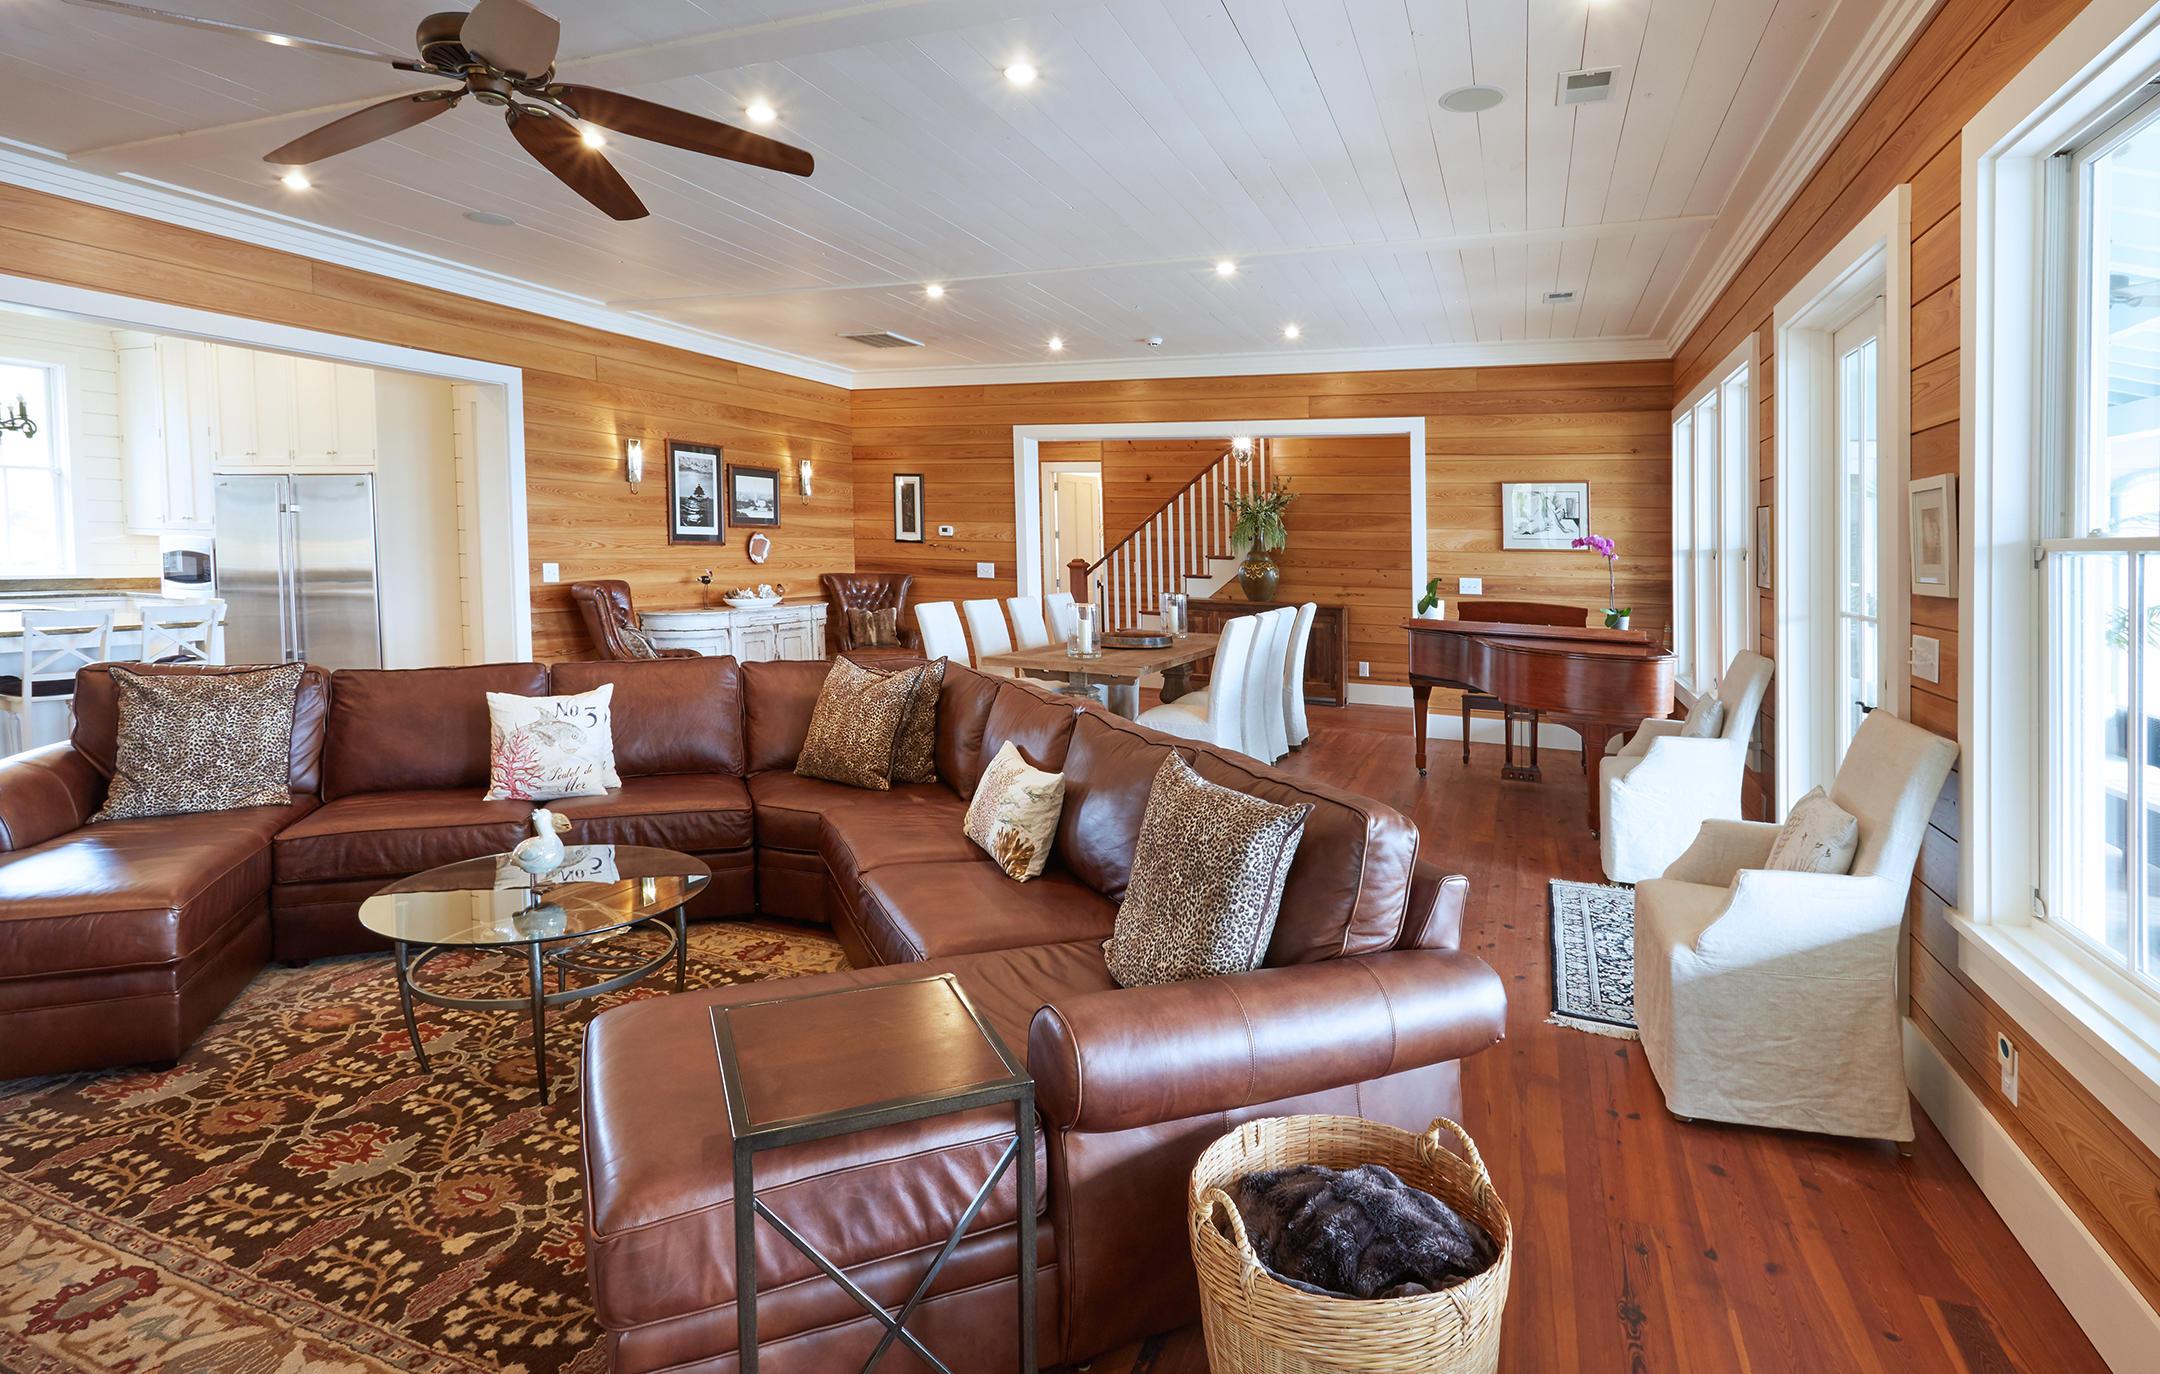 White Stalls Pt Jackson Homes For Sale - 625 Hall, Awendaw, SC - 13